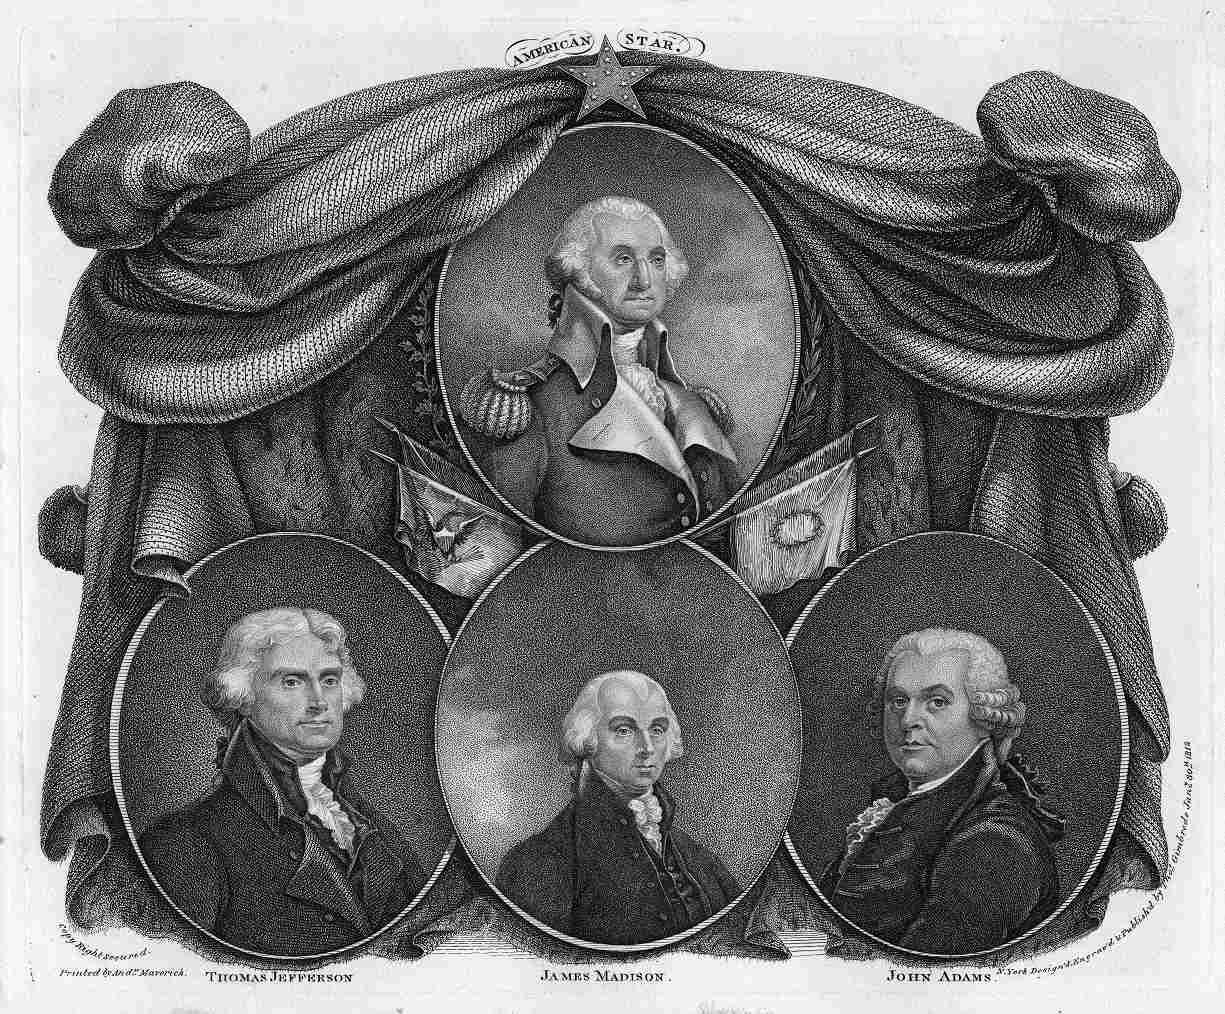 First Four Presidents - George Washington, John Adams, Thomas Jefferson, and James Madison